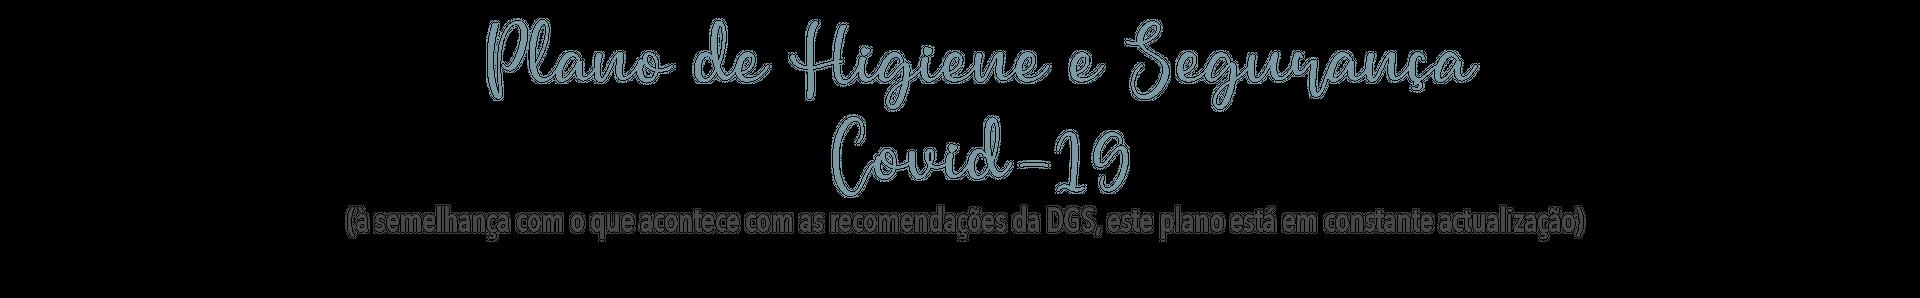 Plano de Higiene e segurança Covid 19 estúdio fotográfico